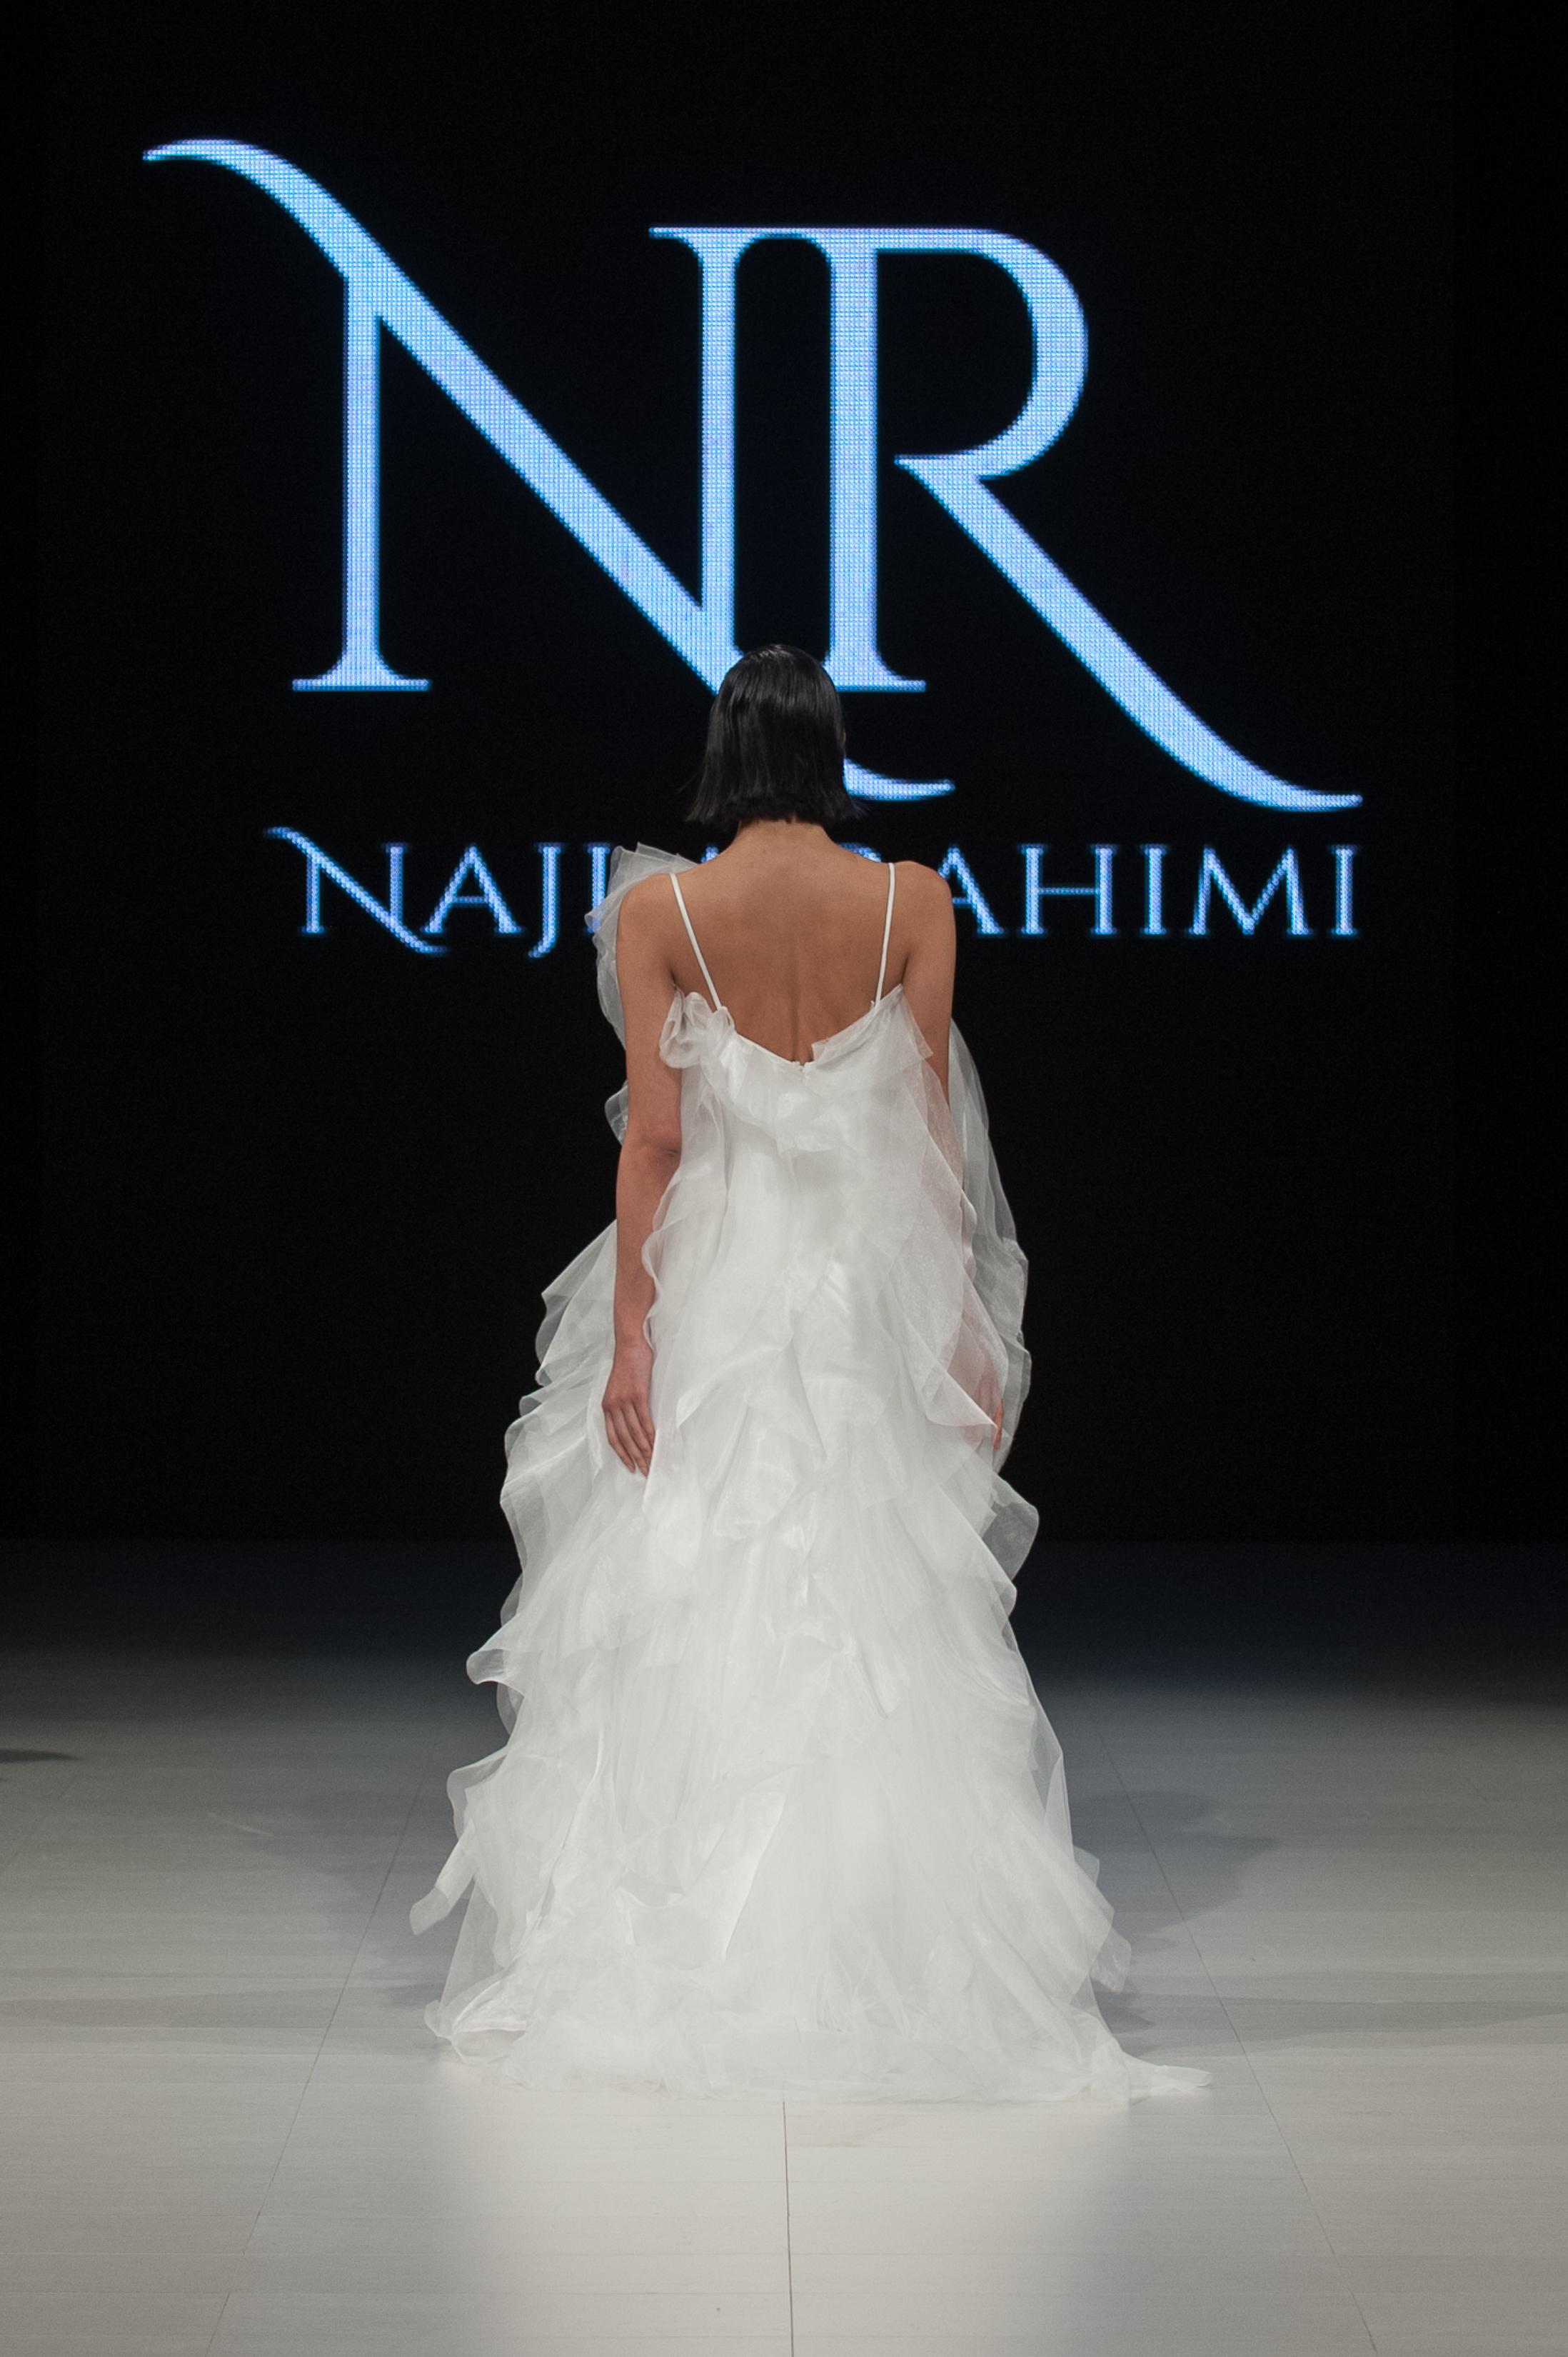 FAT2018-Day1-April17-Najla_Rahimi-Runway-Che_Rosales-LARAWAN-6077.jpg